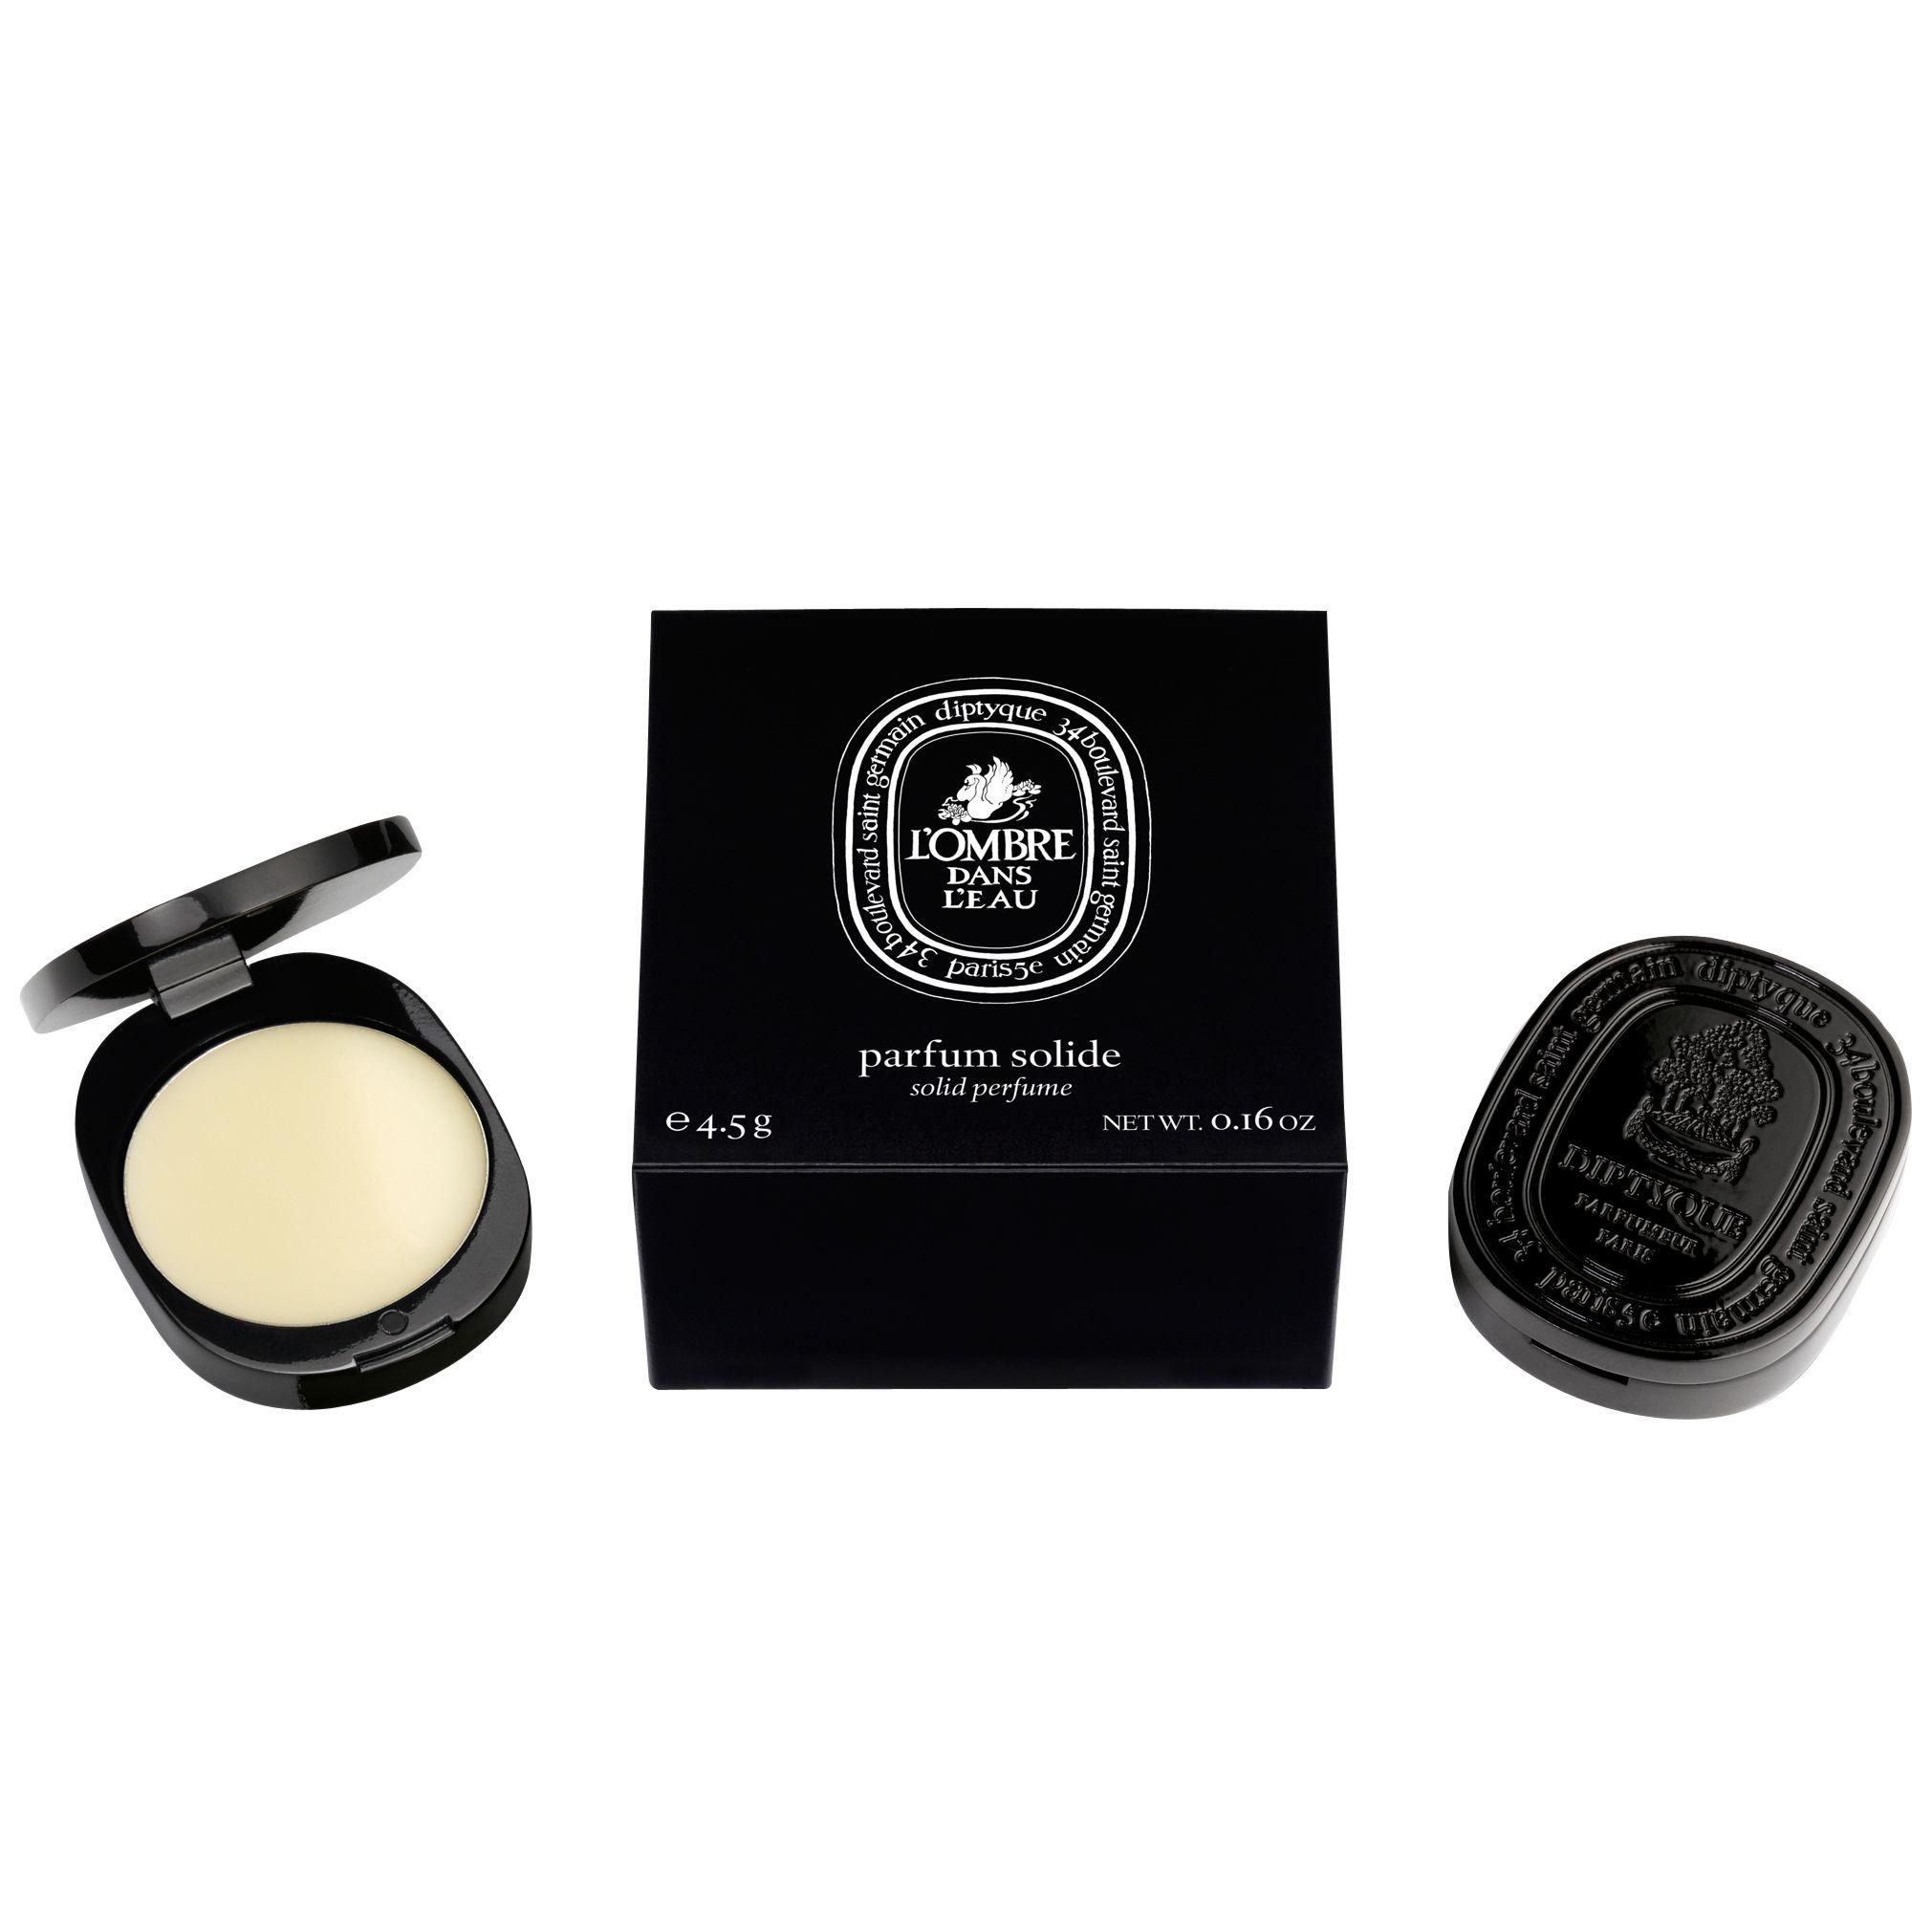 Diptyque Diptyque L'Ombre Dans Solid Perfume, 4.5g